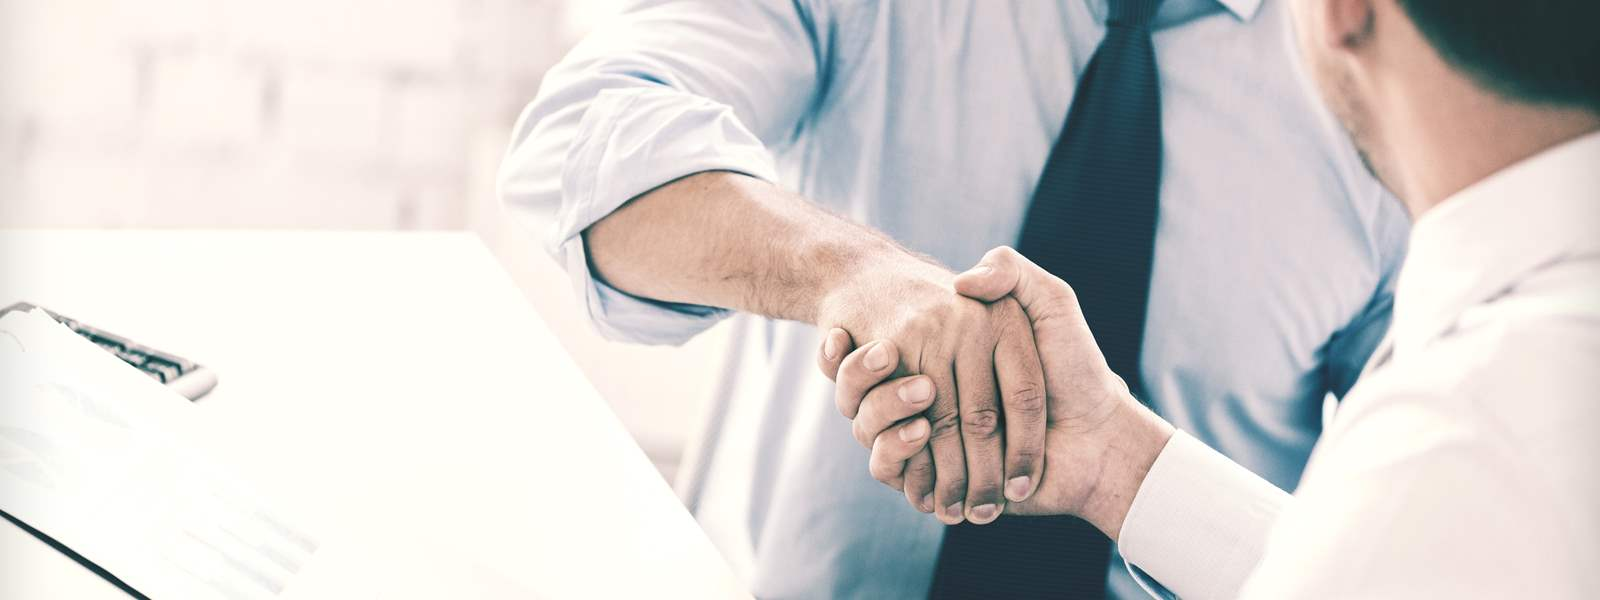 preco-oslovit-architekta-blog-spolupraca-podanie-ruky-suhlas-01